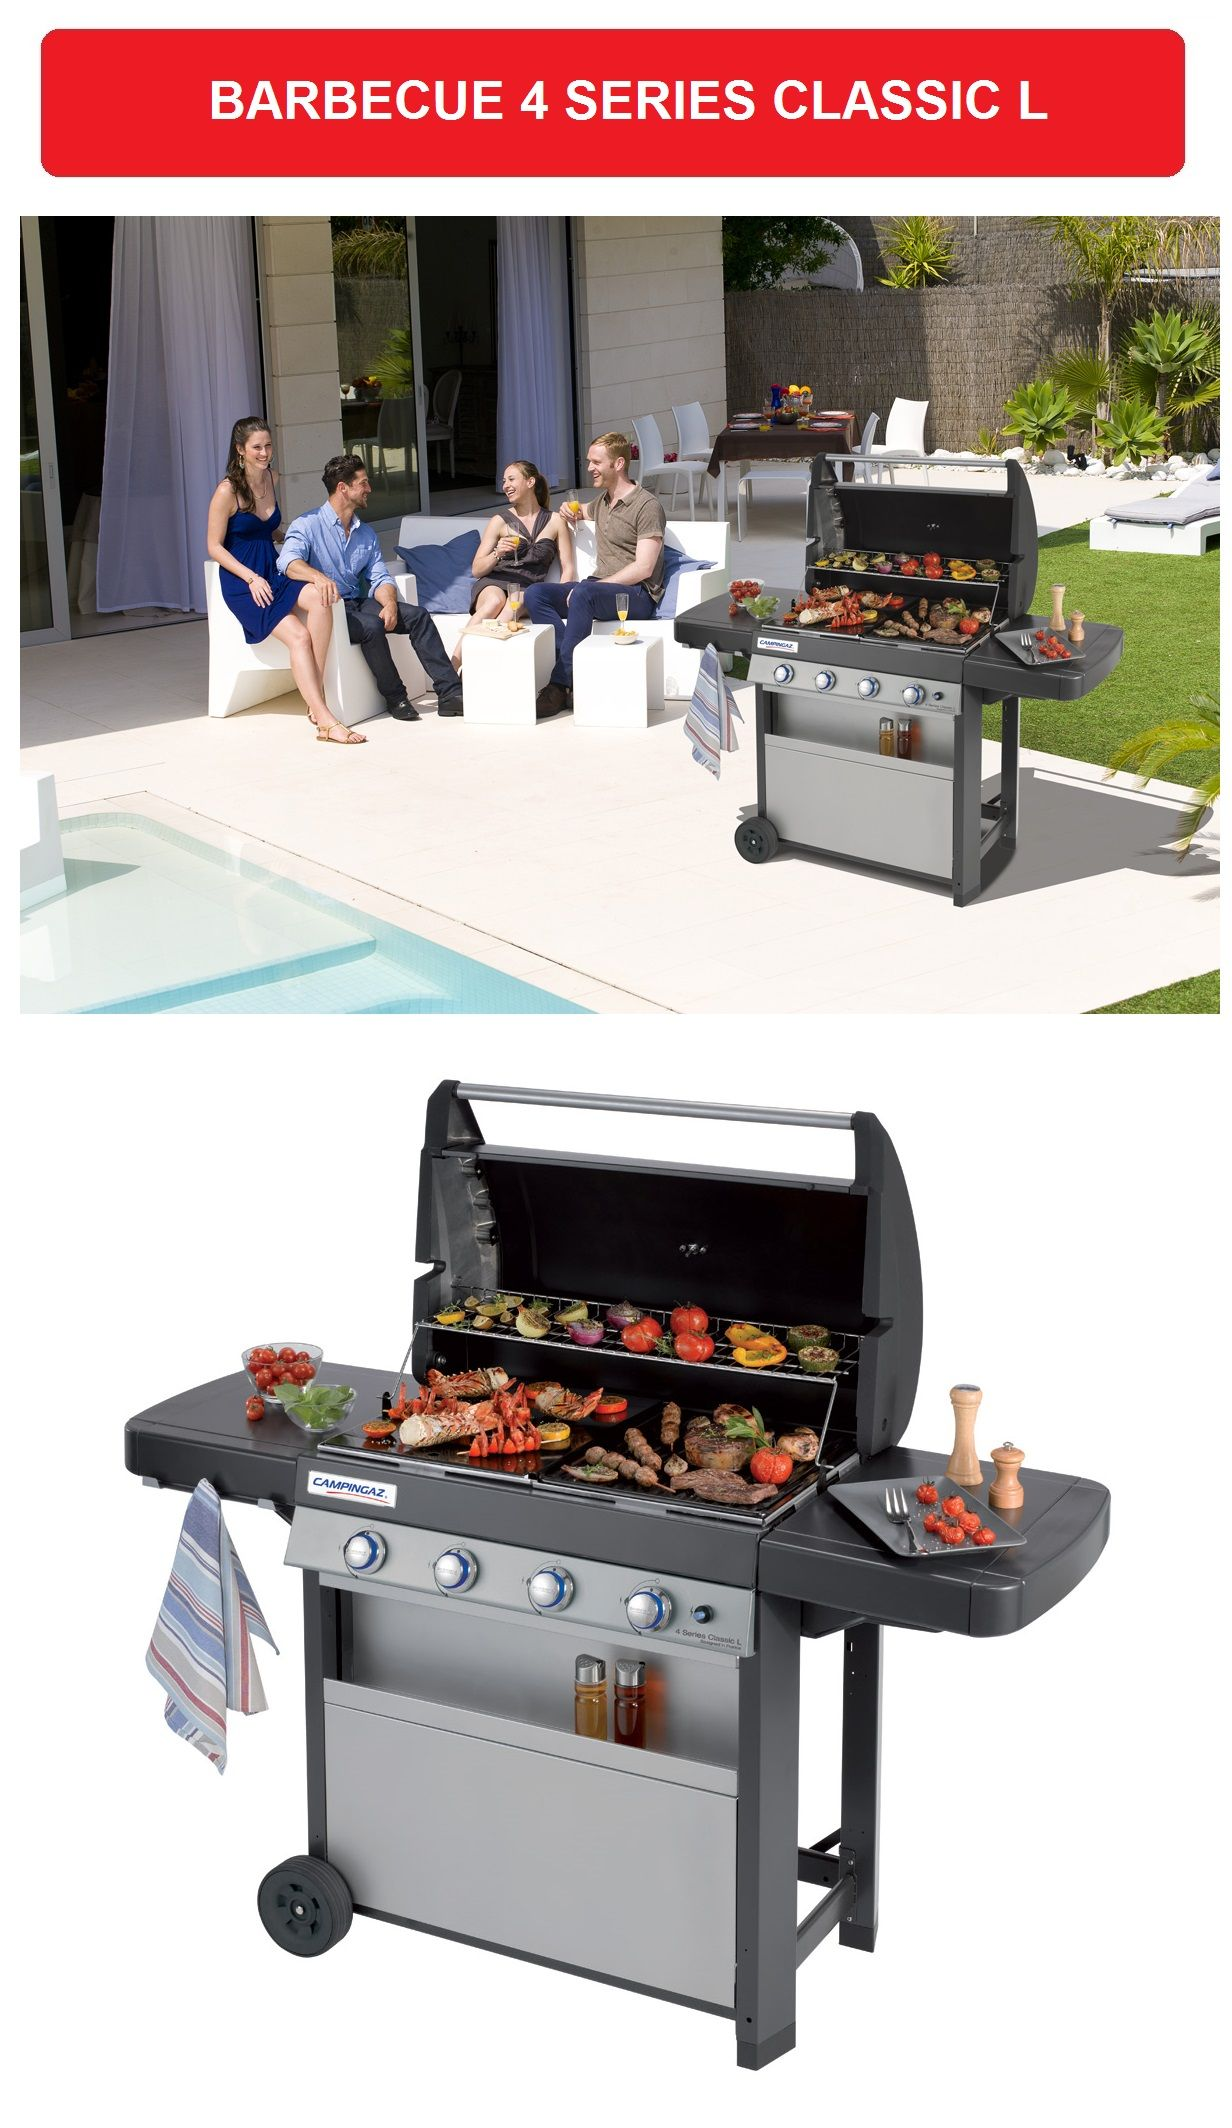 barbecue a gas 4 series classic l campingaz sistema. Black Bedroom Furniture Sets. Home Design Ideas